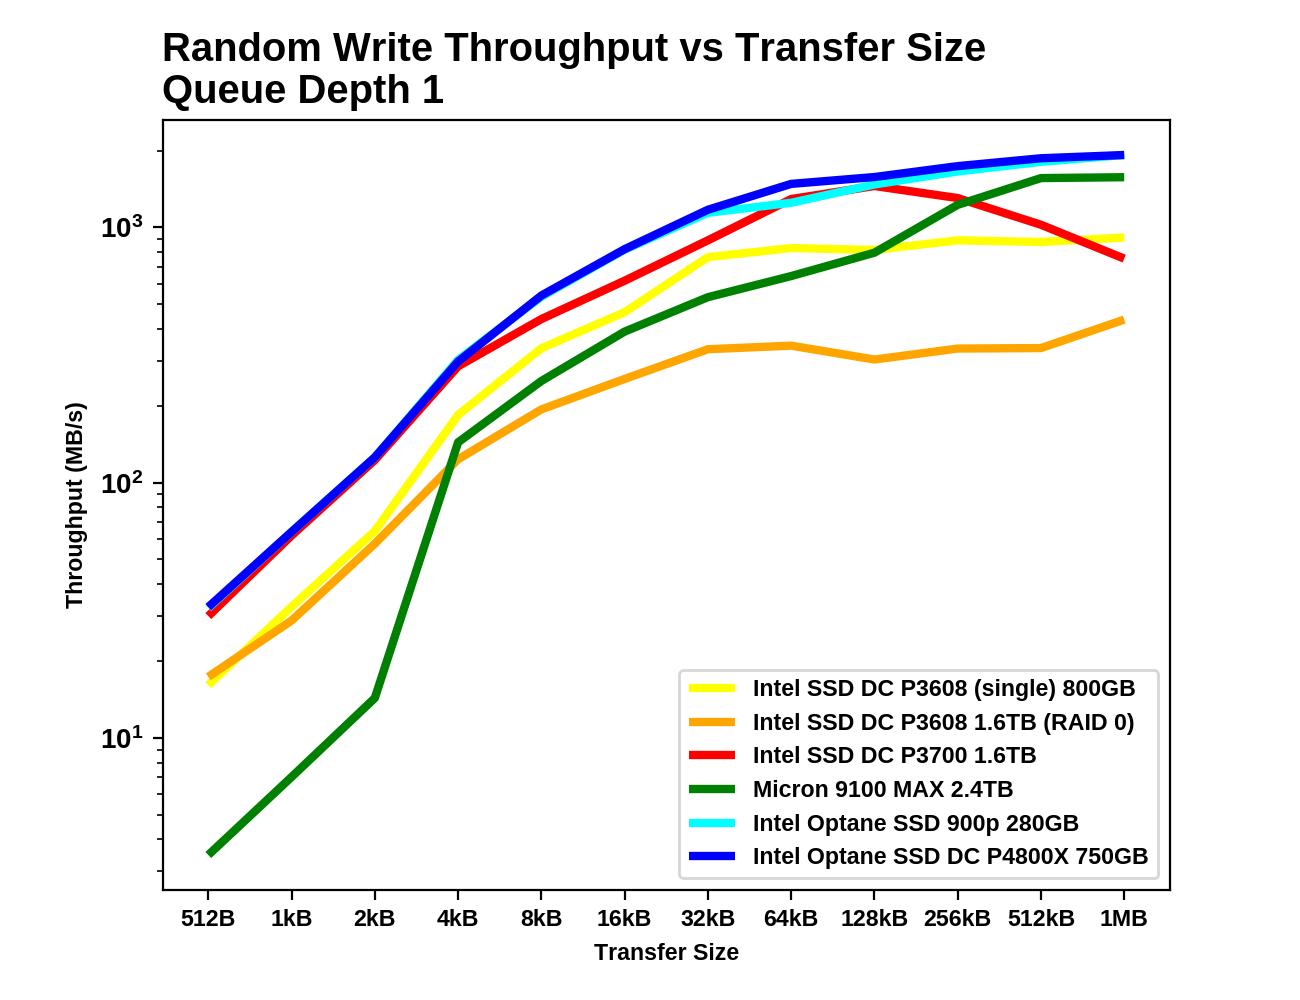 Performance VS Transfer Size - Intel Optane SSD DC P4800X